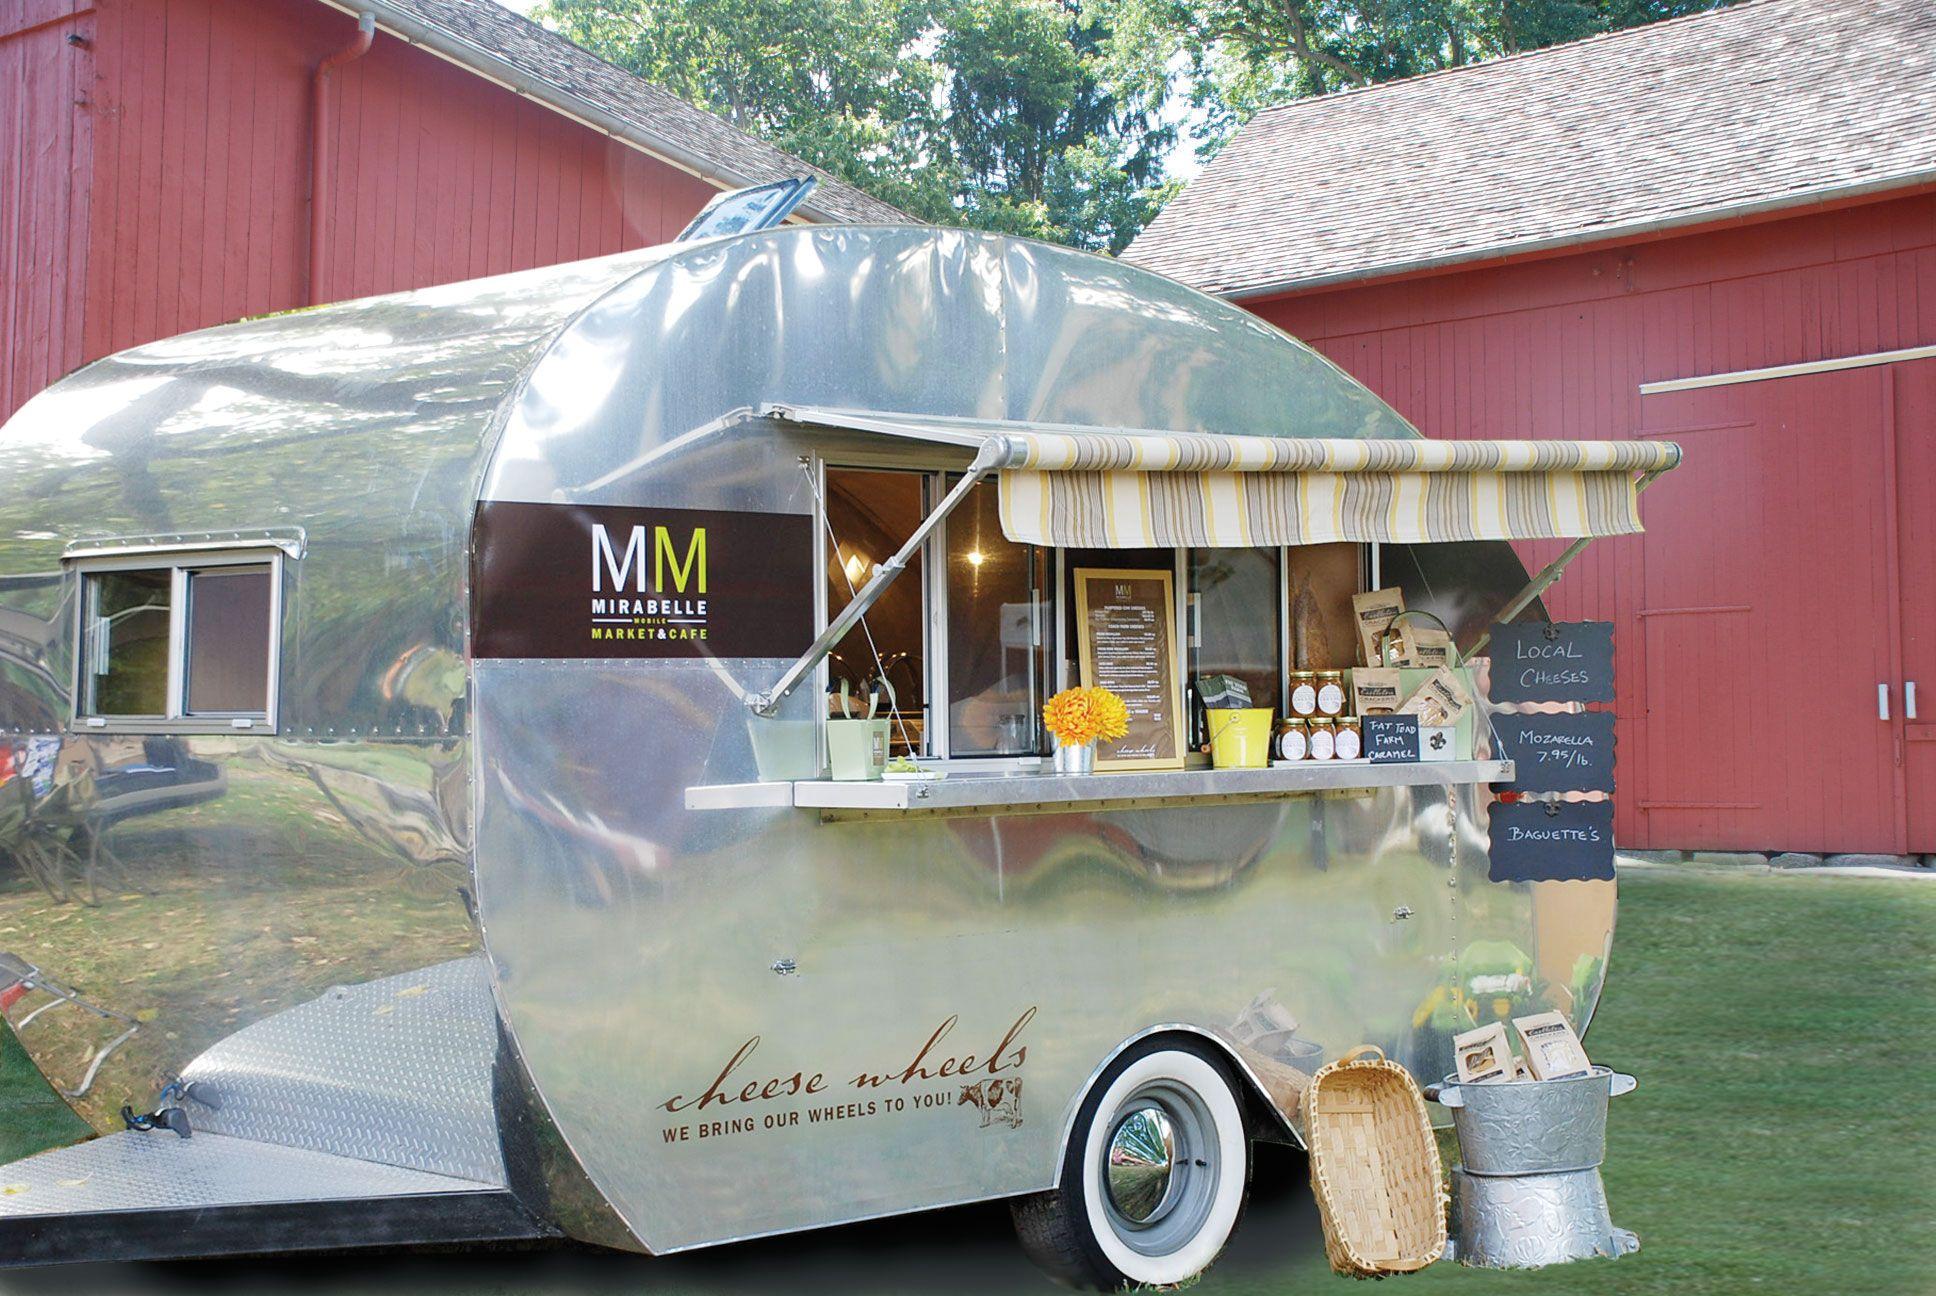 Cheese Wheels Pop Up Vintage Shops Food trailer